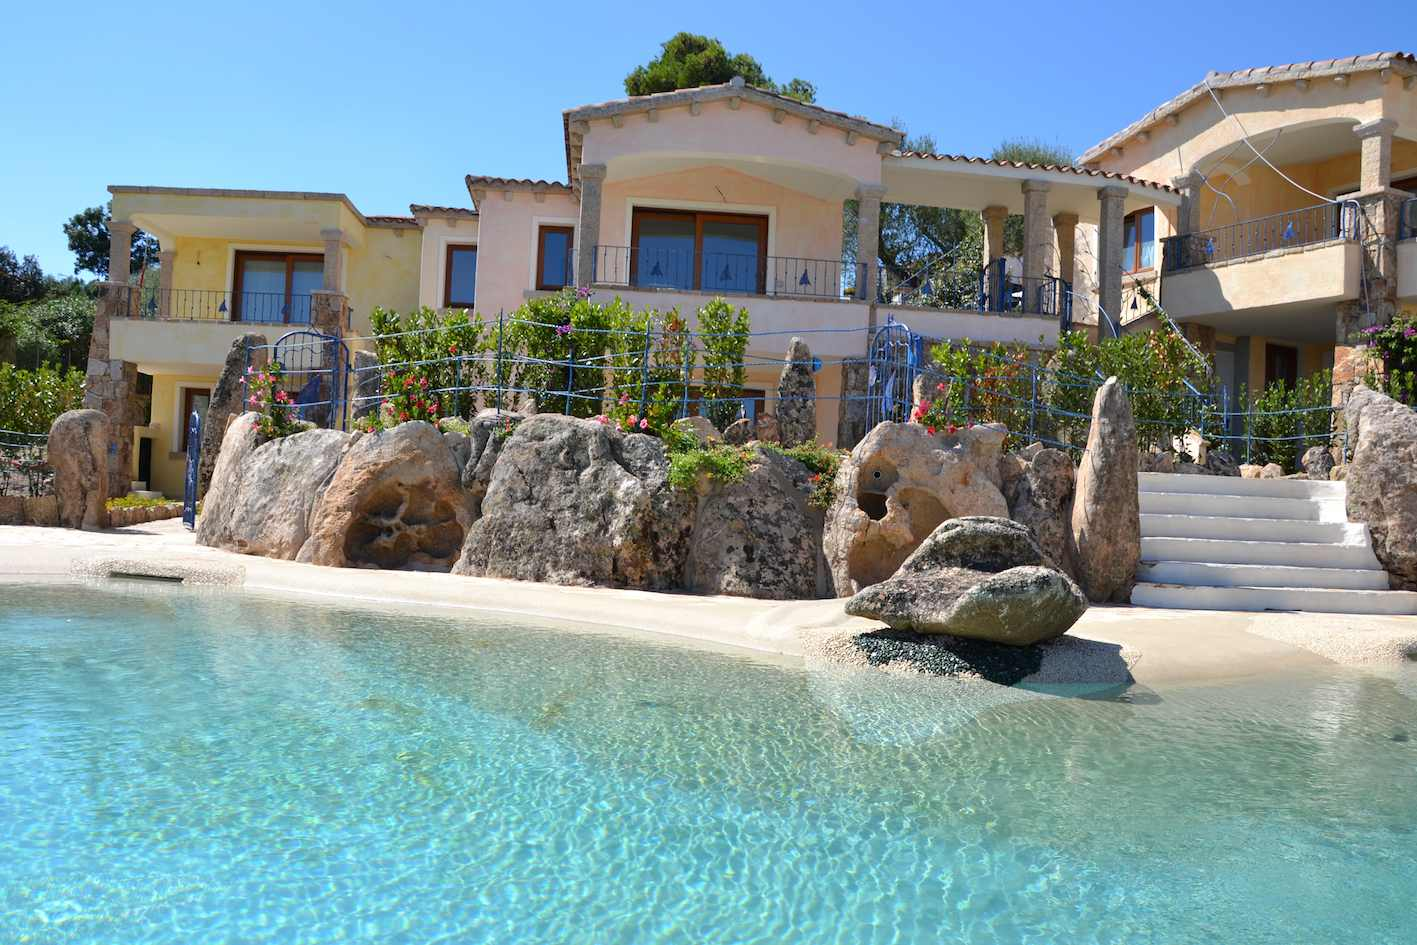 Villa tavolara - Ville in vendita con piscina ...